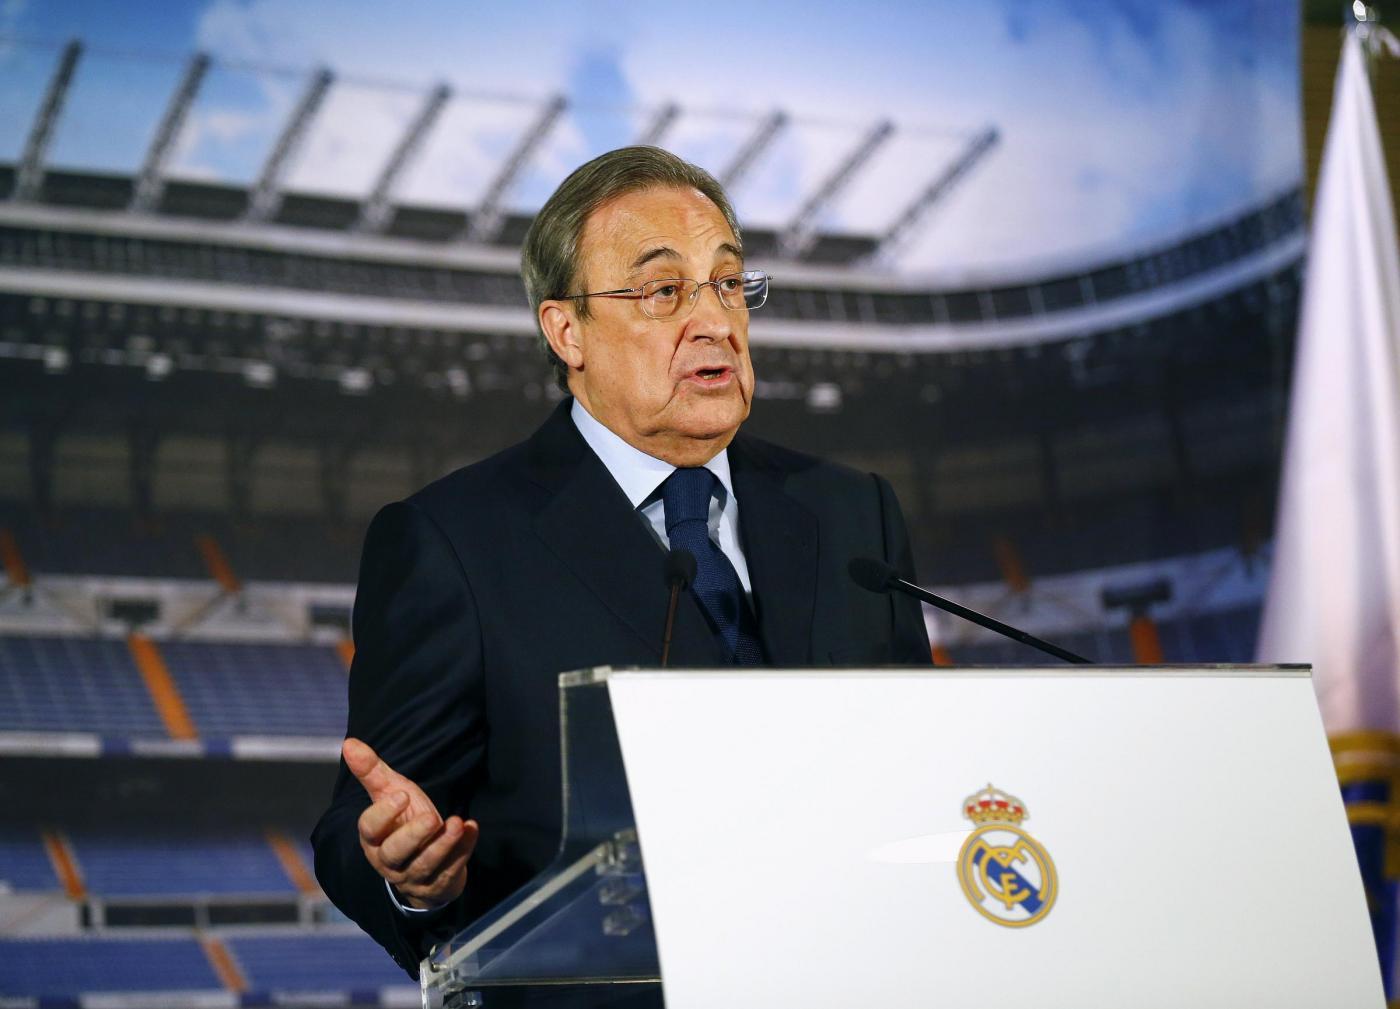 Dalla Spagna: il Real Madrid monitora Milinkovic-Savic